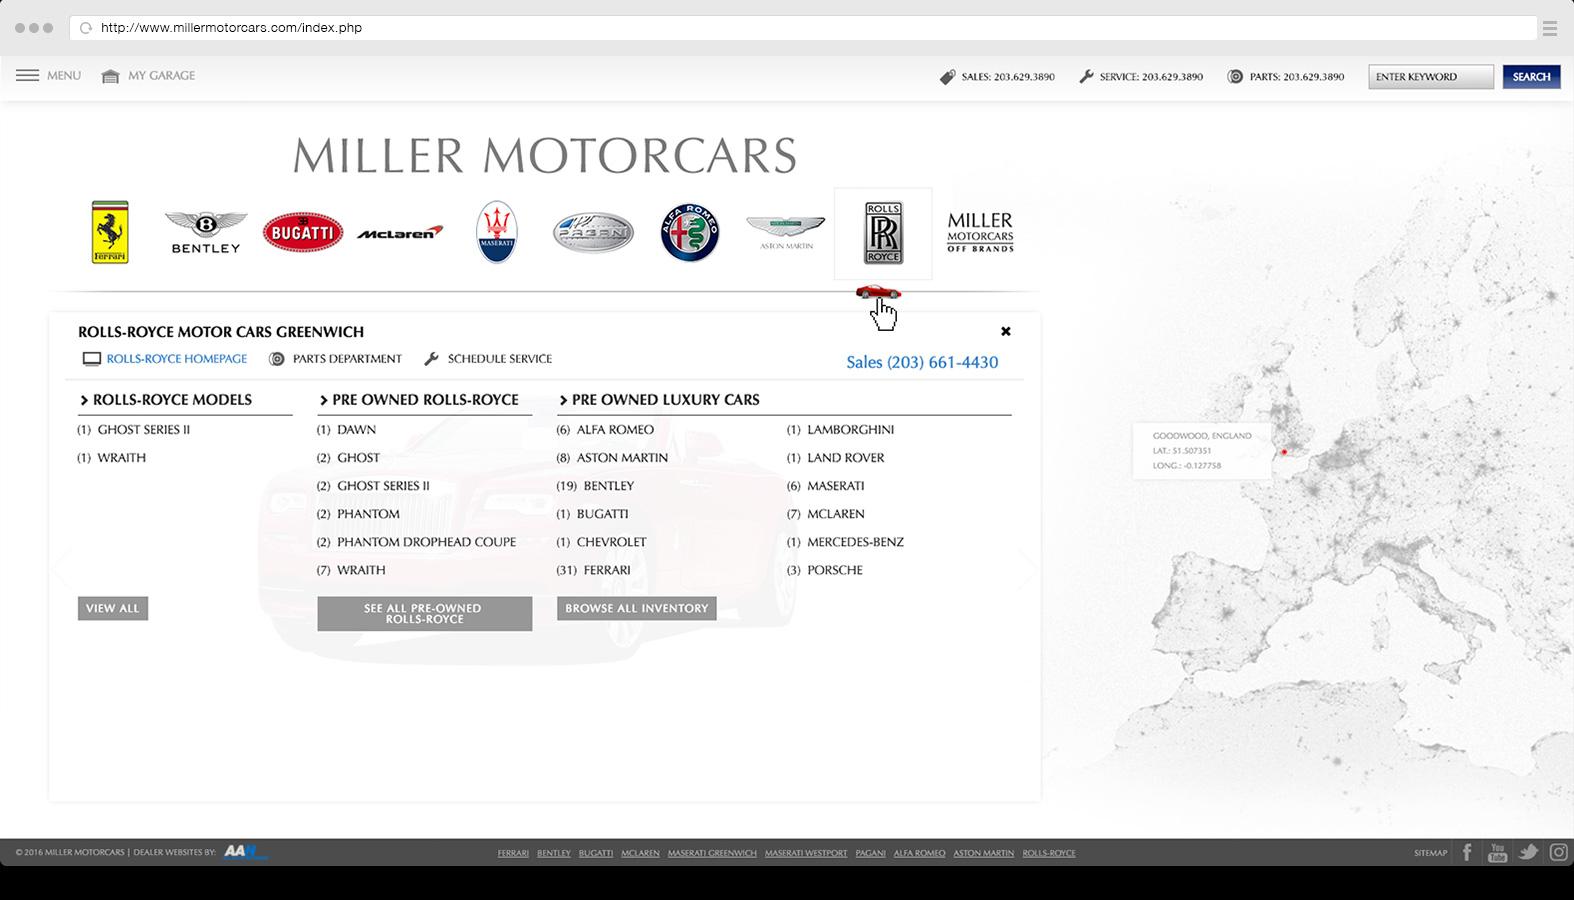 Portal / Landing page navigation